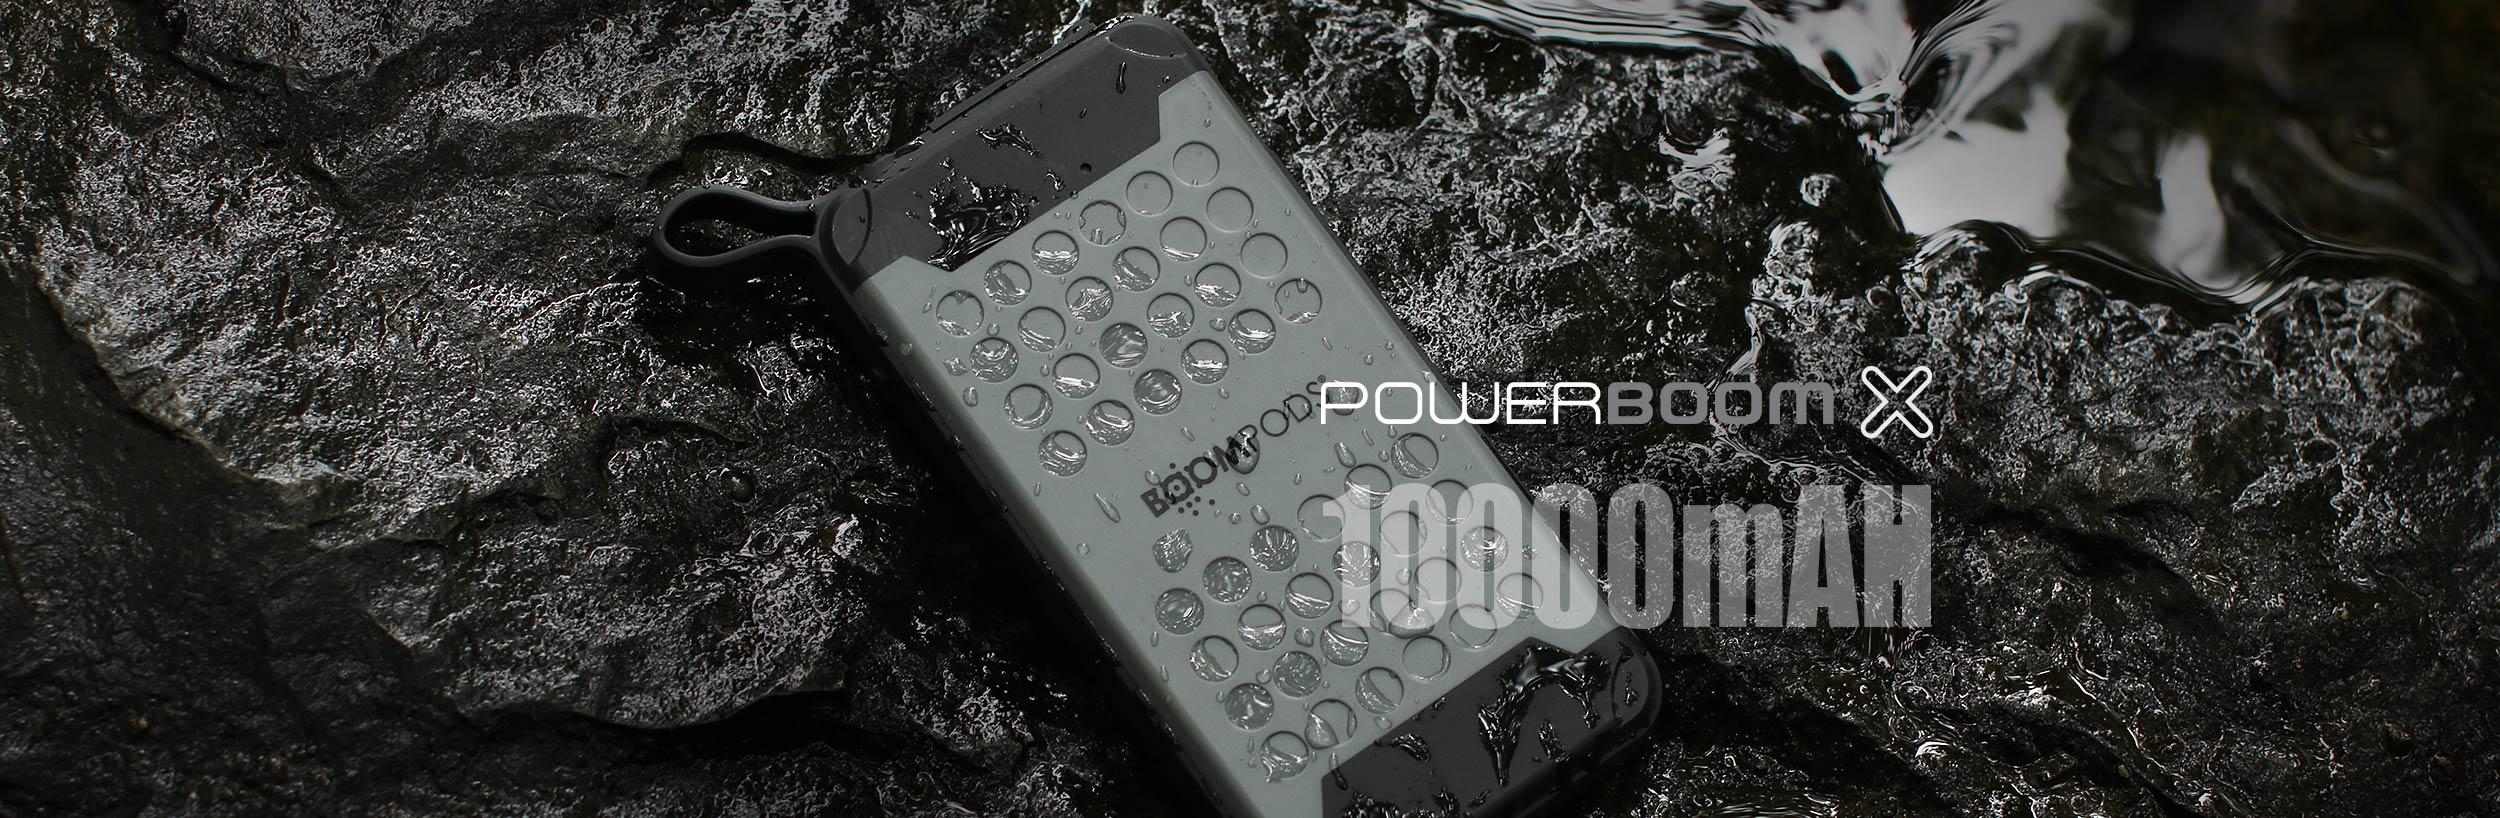 Boompods Powerboom X 10 Waterproof